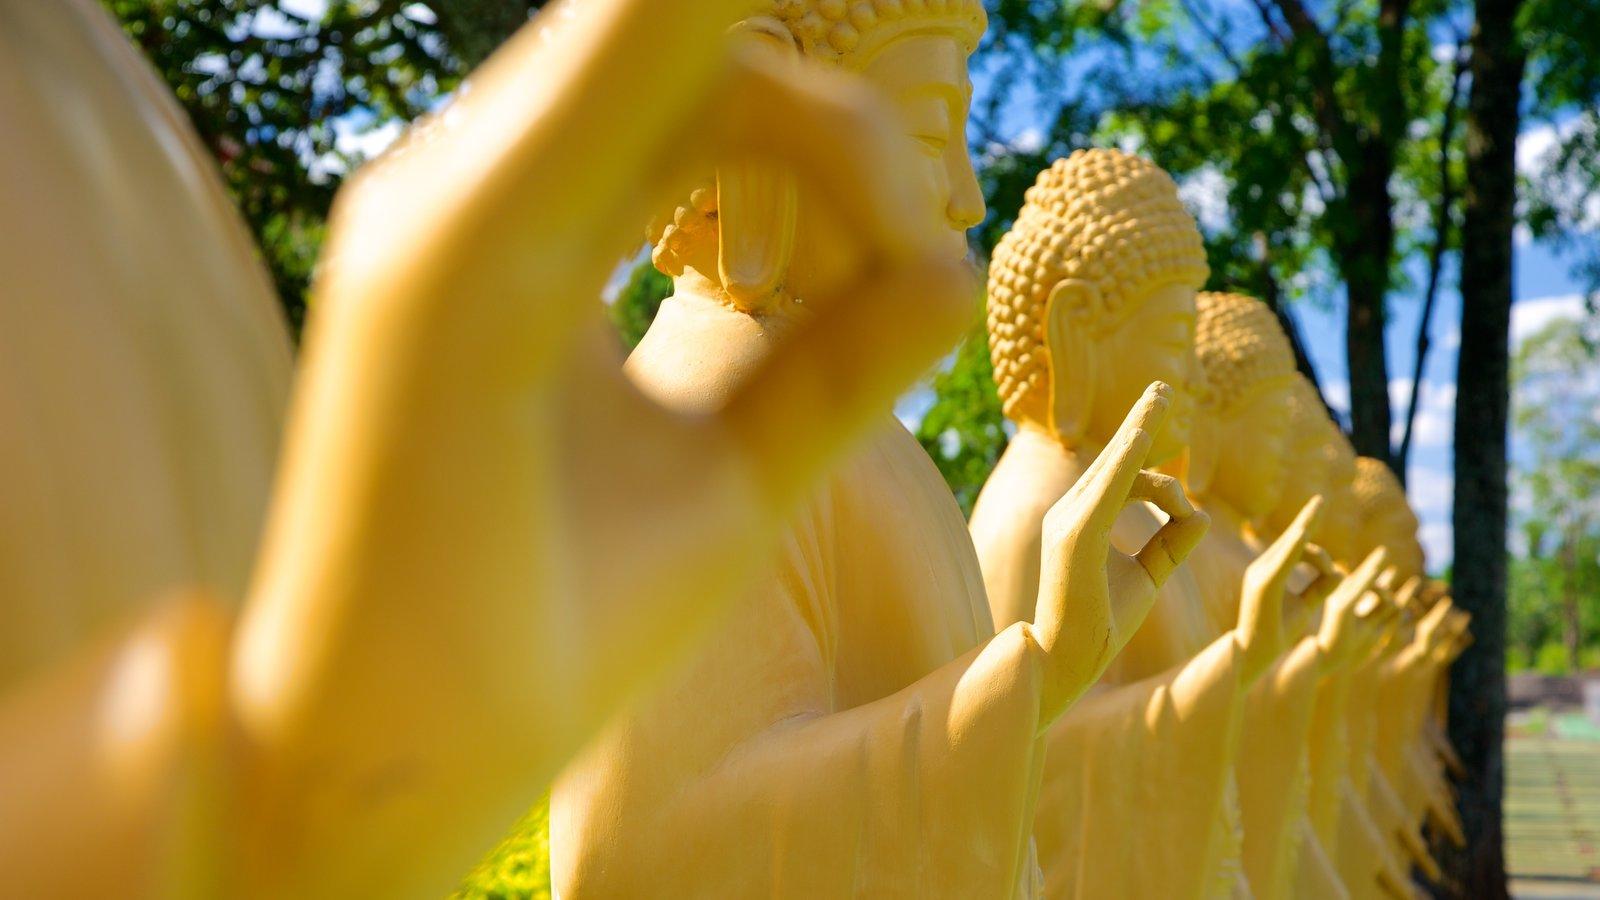 Templo Budista caracterizando elementos religiosos e arte ao ar livre